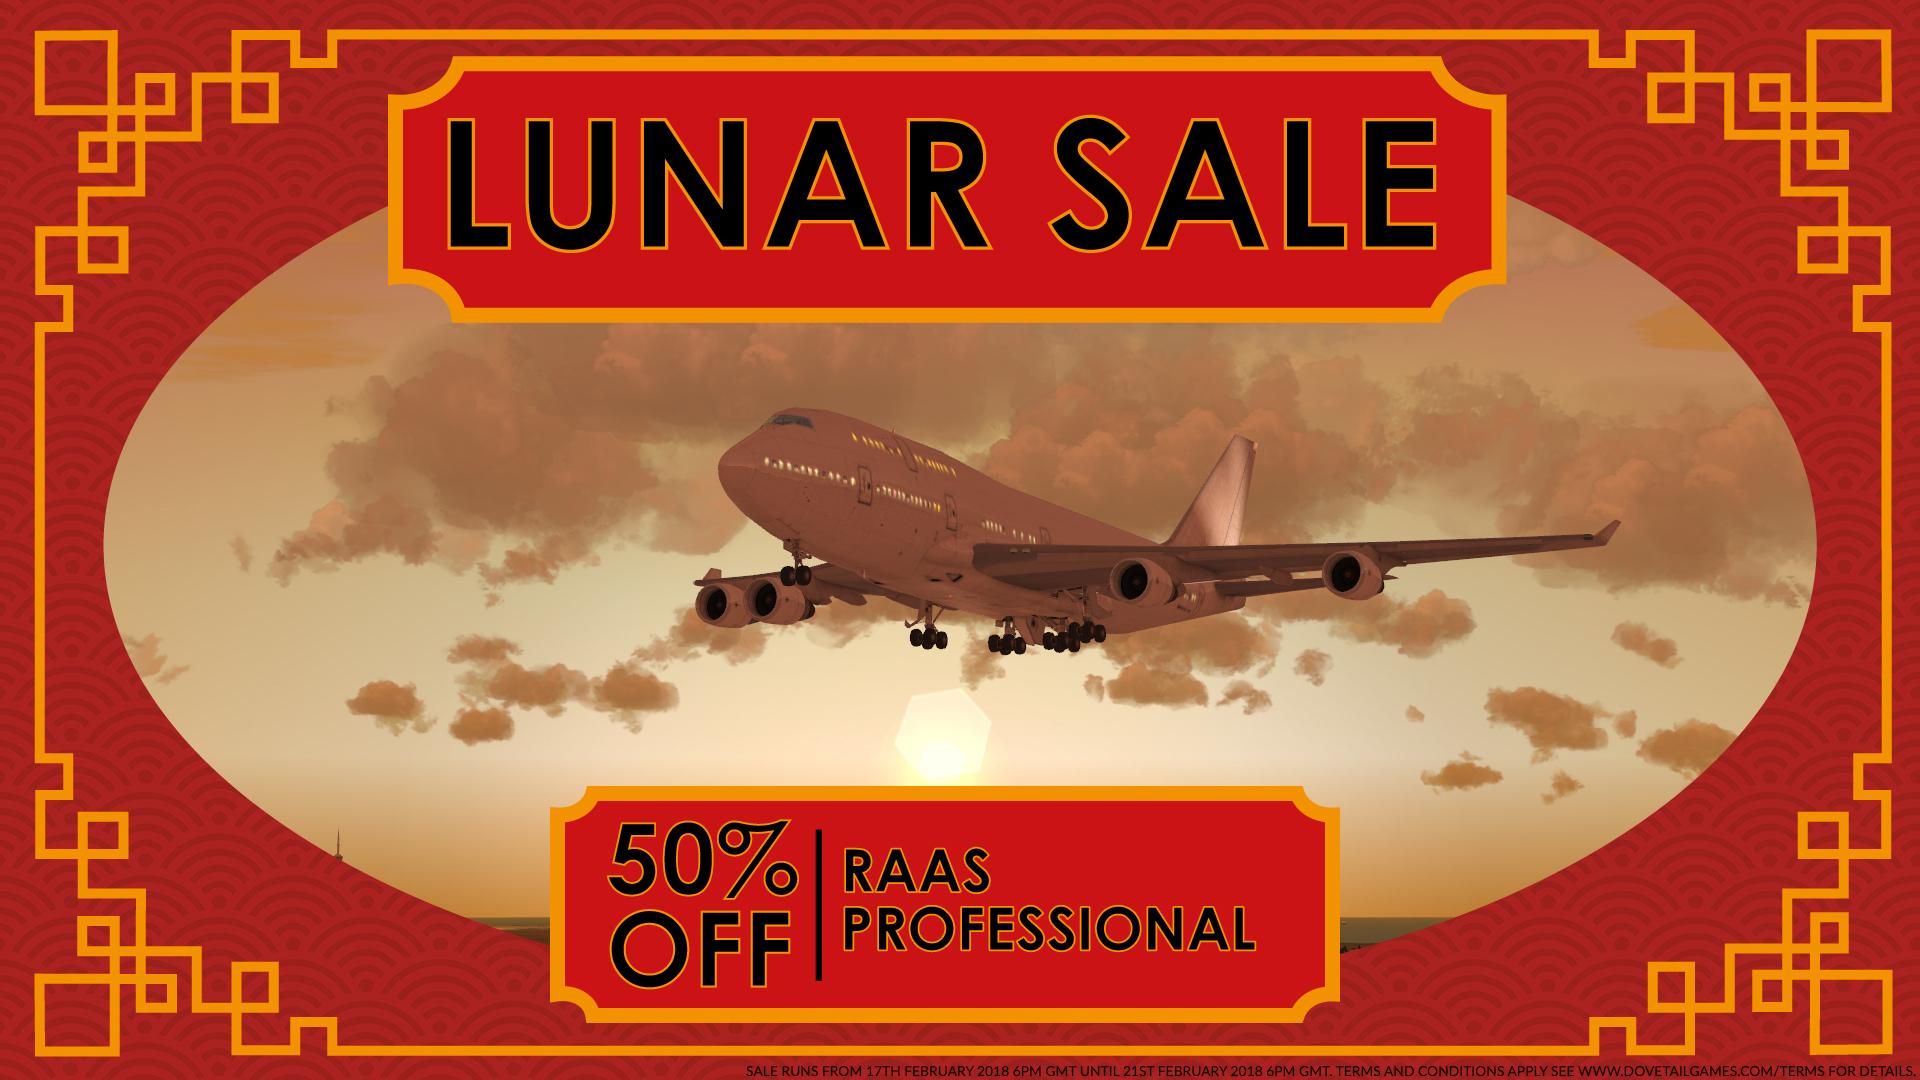 Swathes of savings in the FSX: SE Lunar Sale - Microsoft